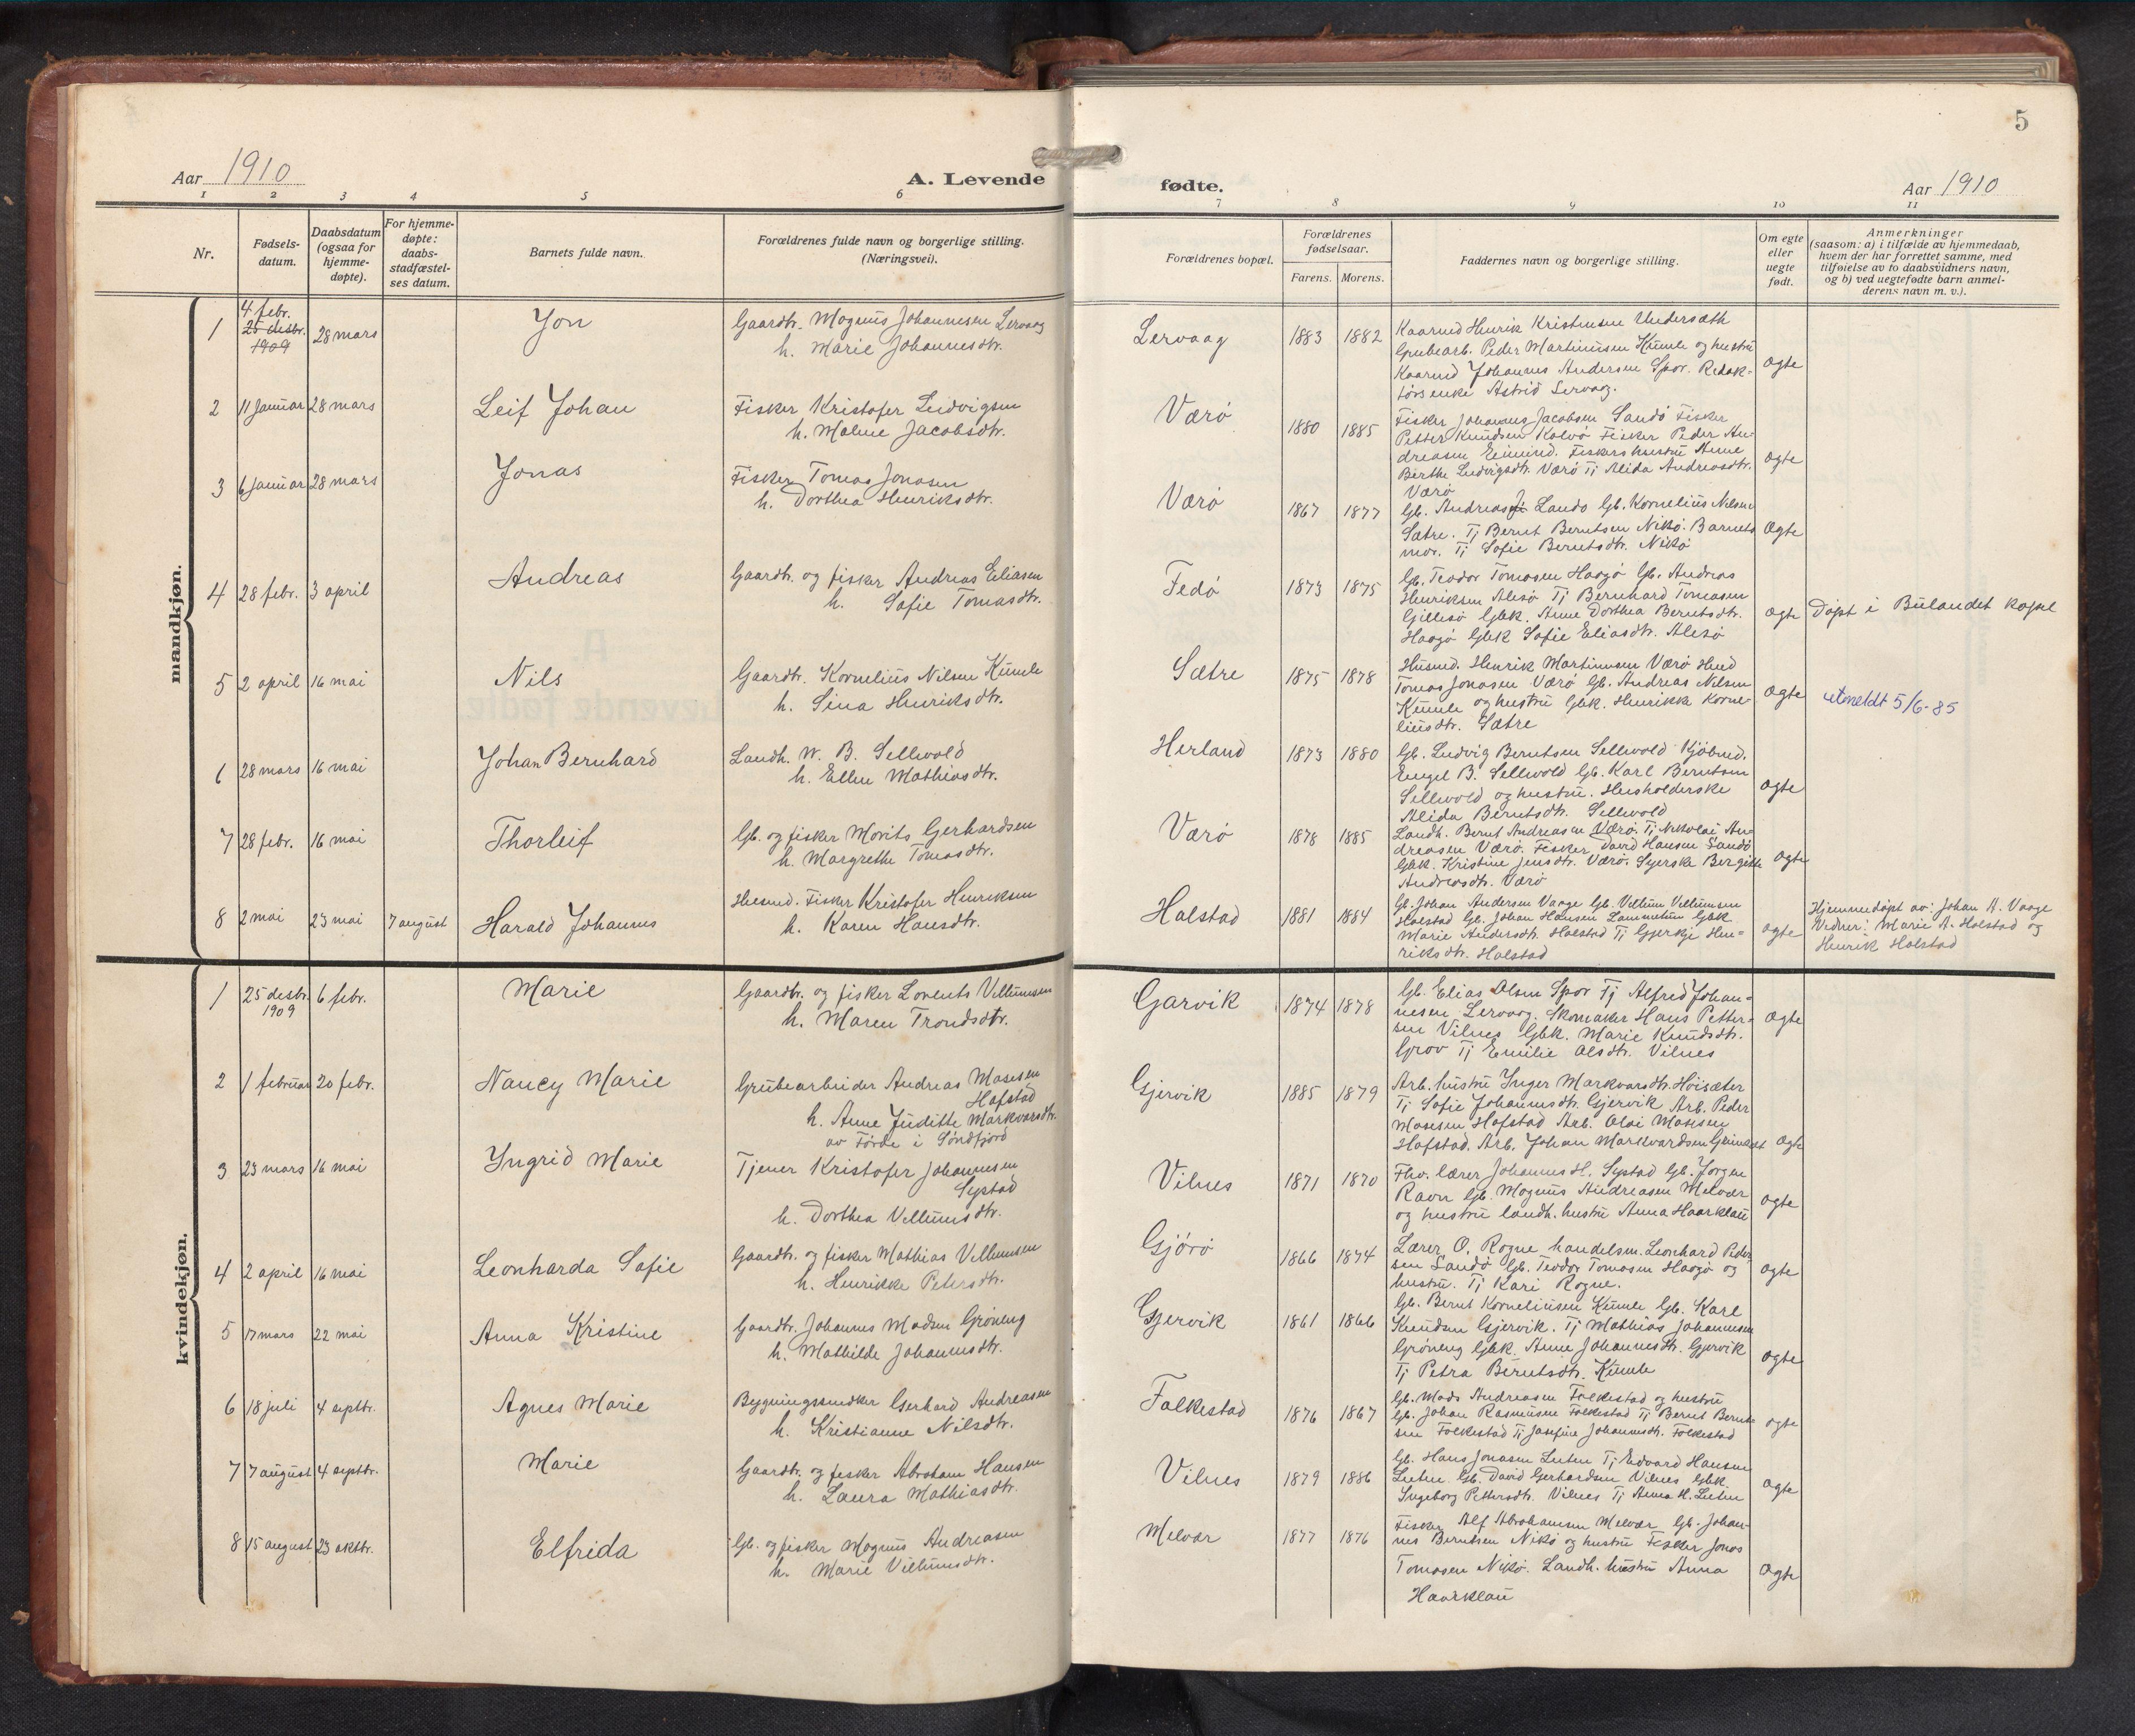 SAB, Askvoll sokneprestembete, H/Hab/Habb/L0002: Klokkerbok nr. B 2, 1910-1947, s. 4b-5a